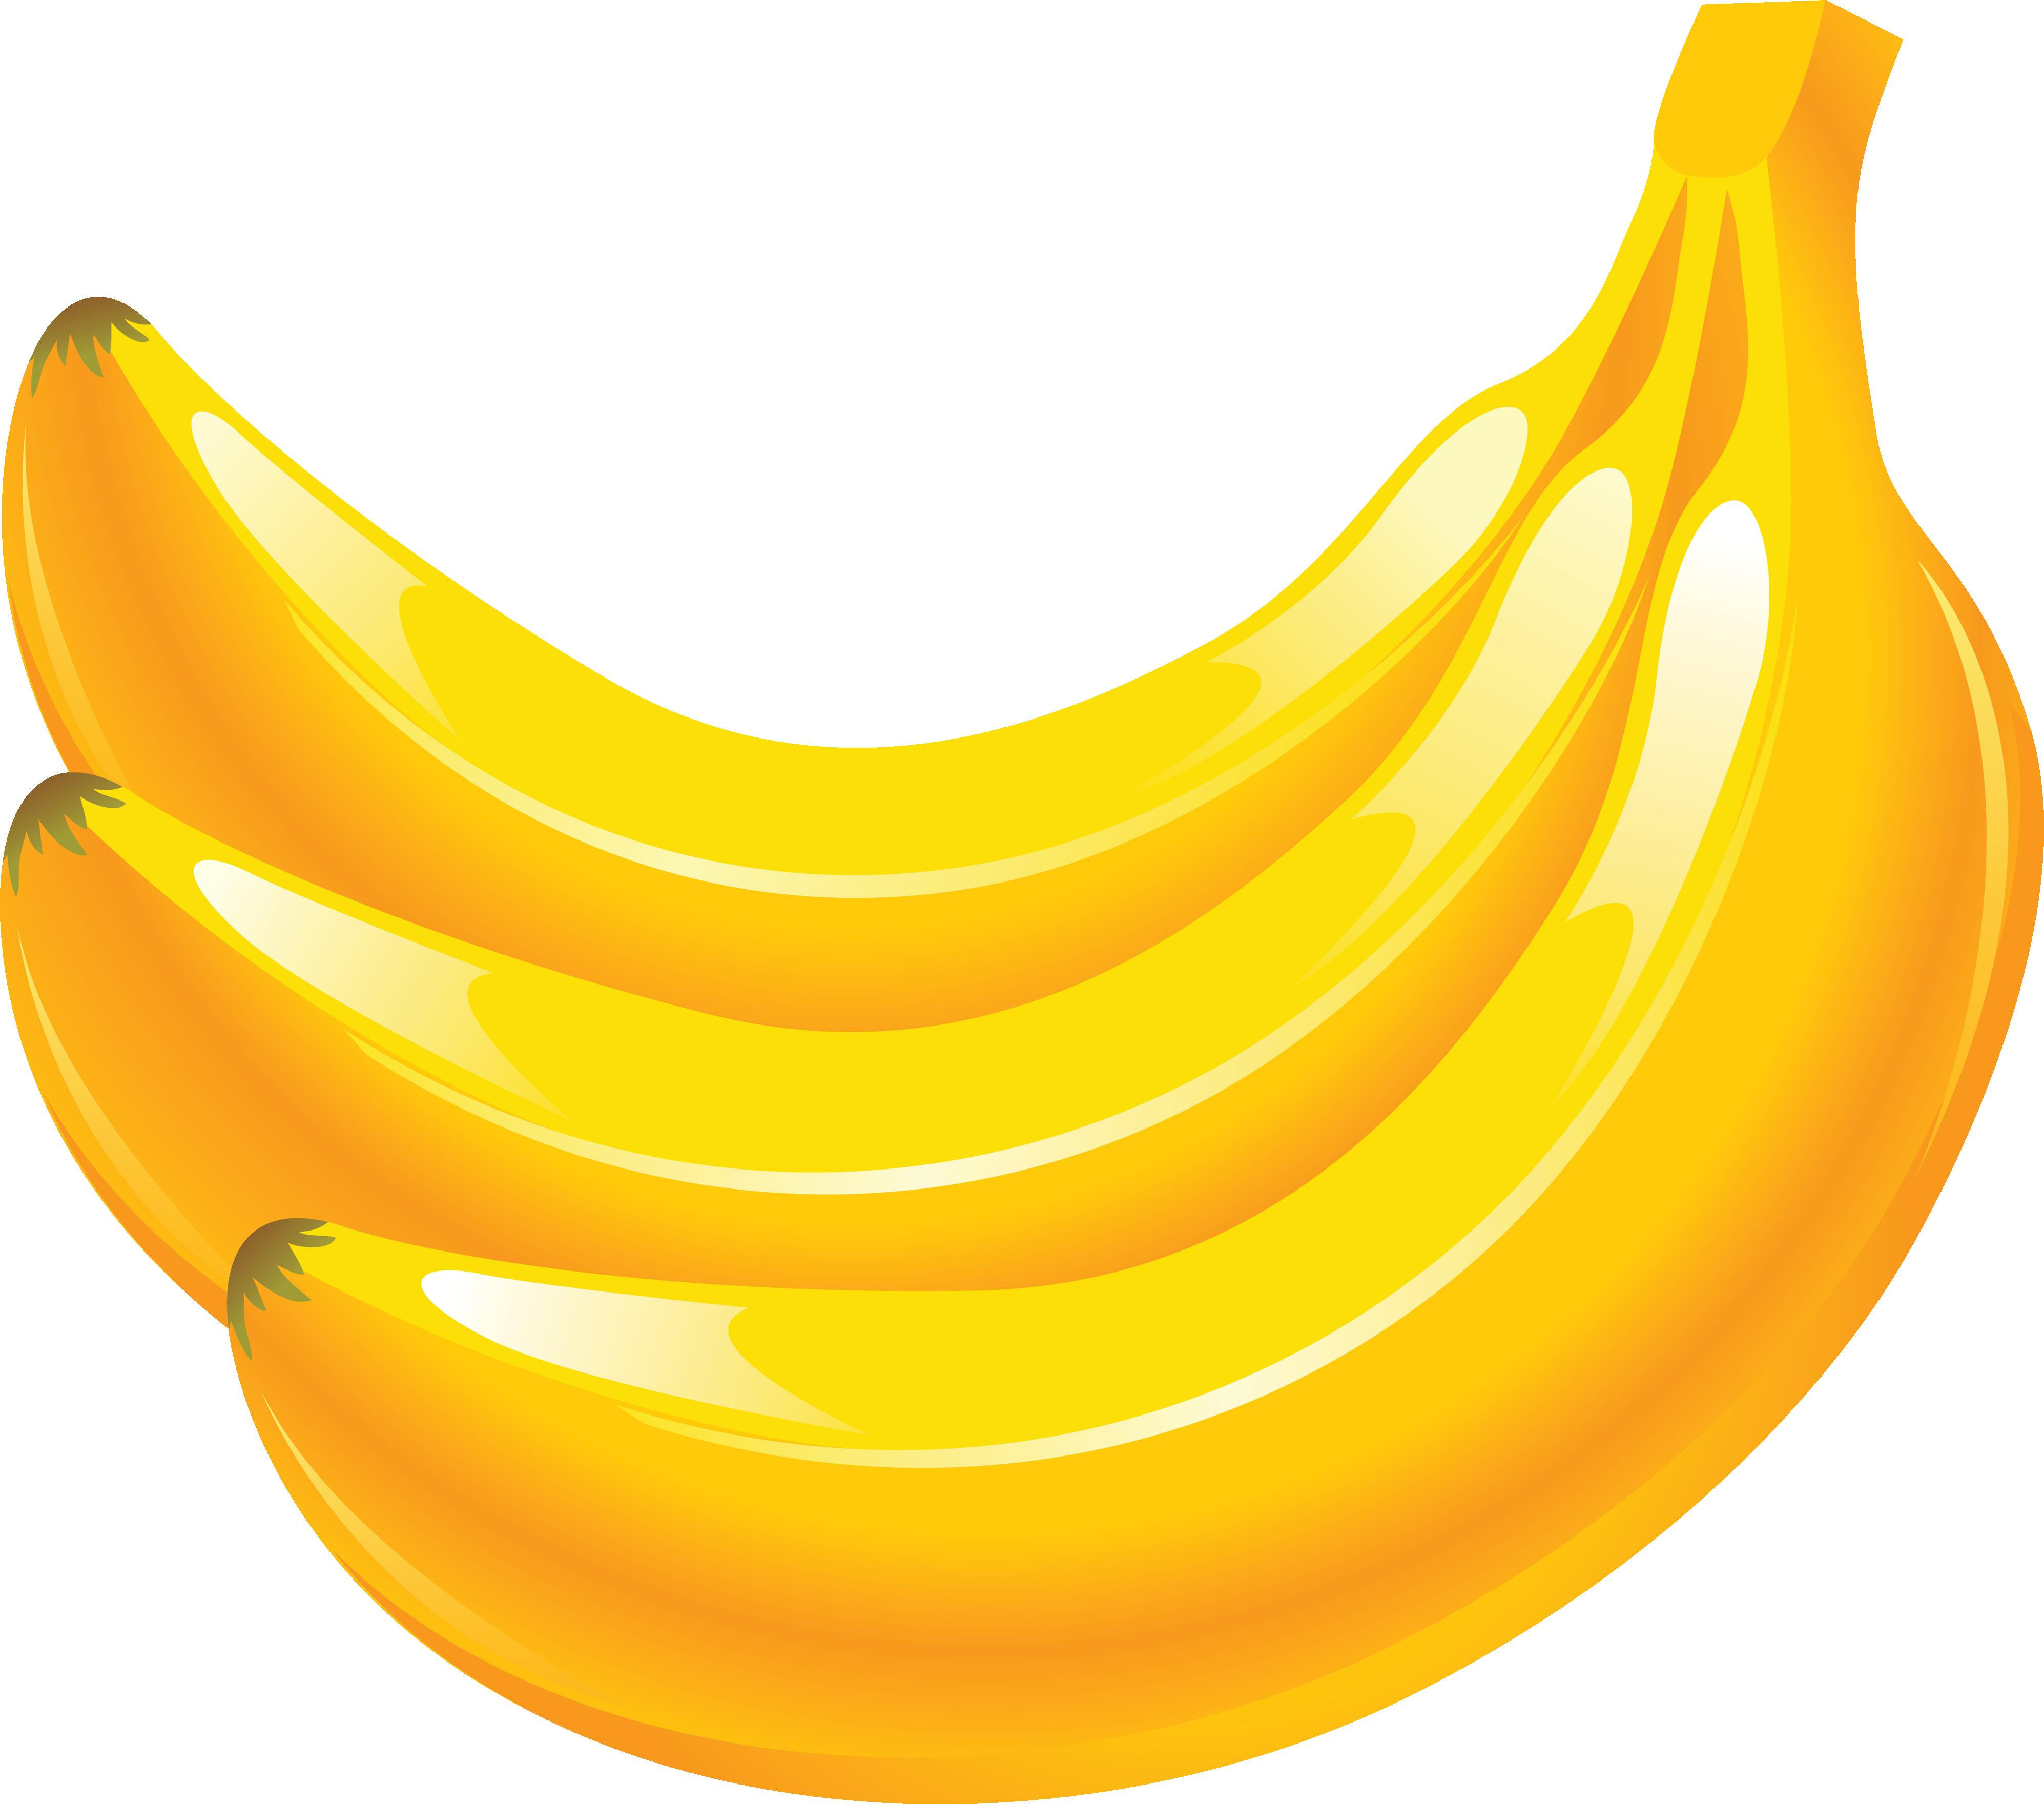 Pin by hopeless on. Bananas clipart 2 banana